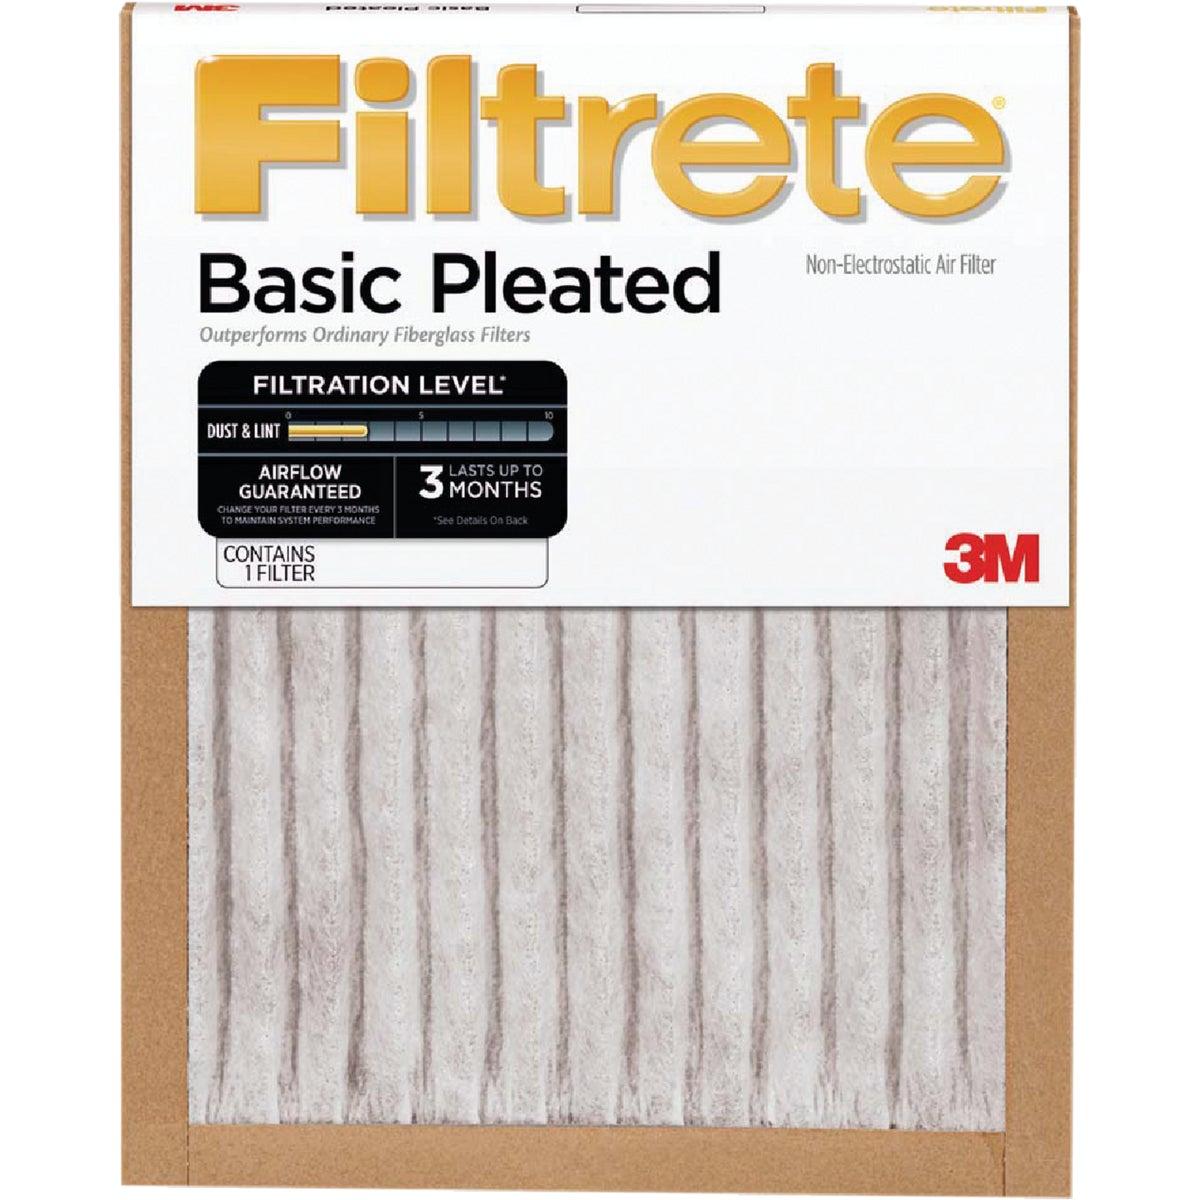 3M Filtrete 16 In. x 25 In. x 1 In. Basic Pleated 250 MPR Furnace Filter